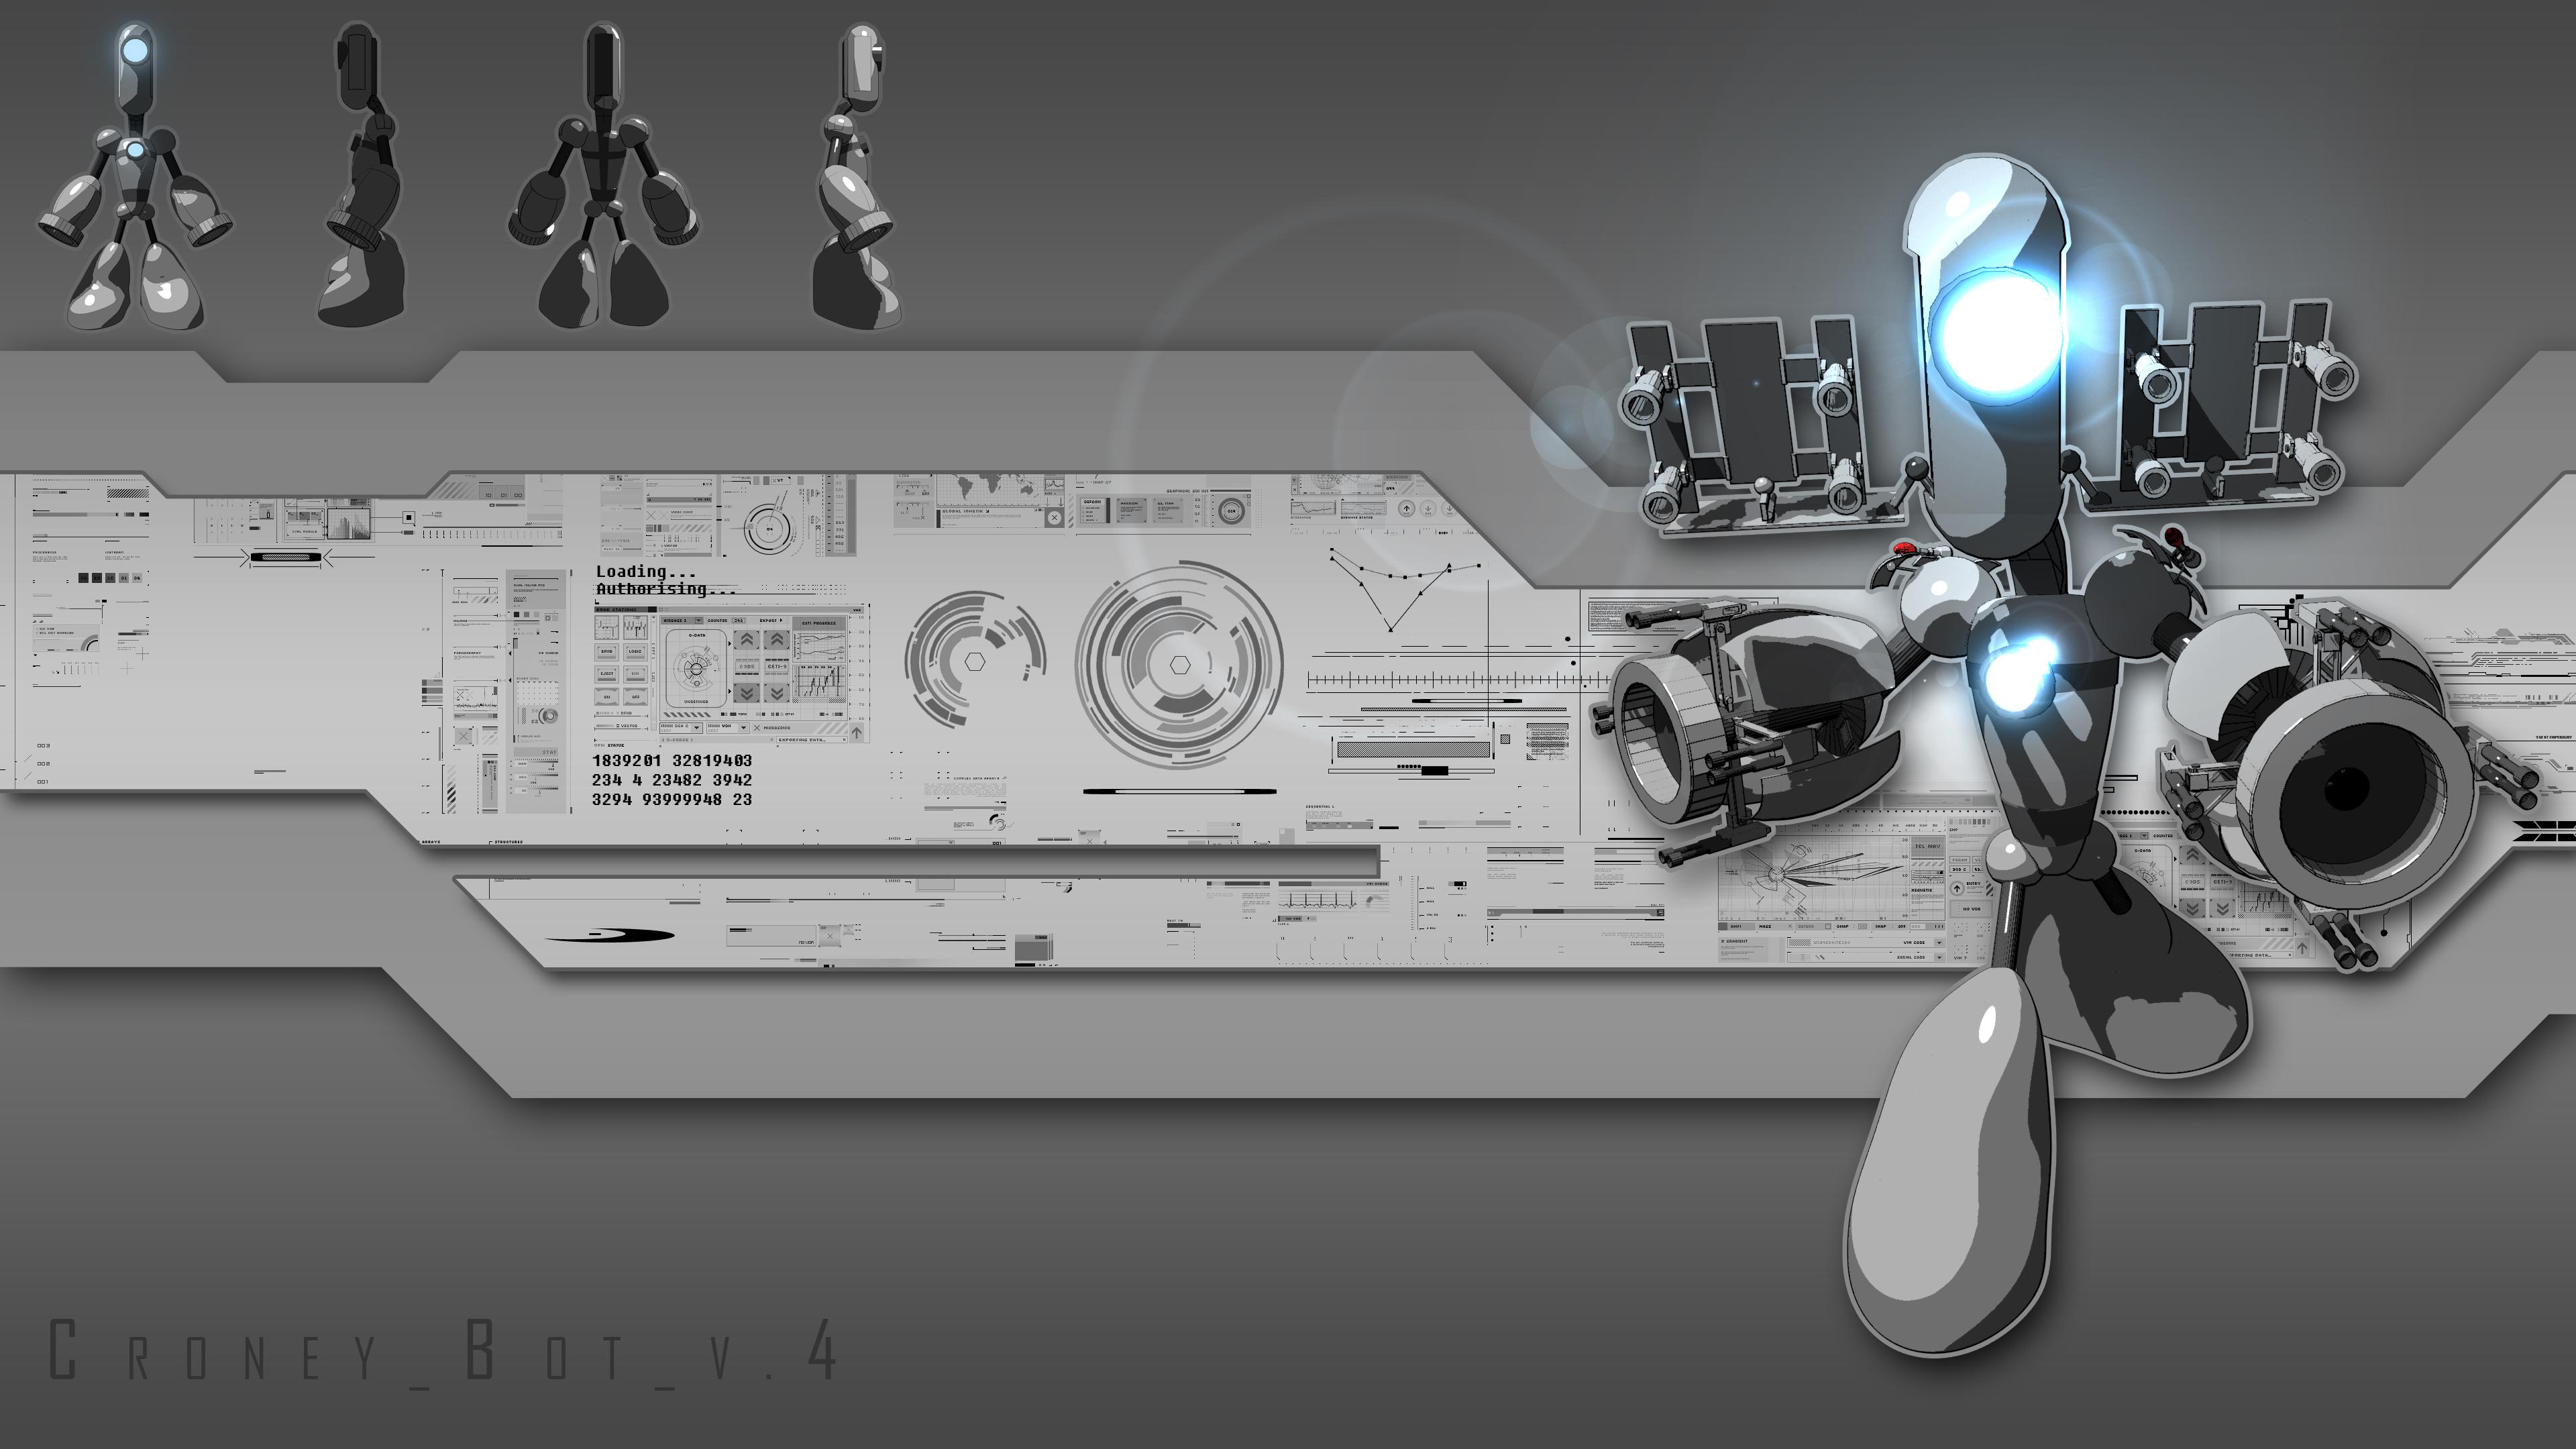 Croney Bot v4 Wallpaper